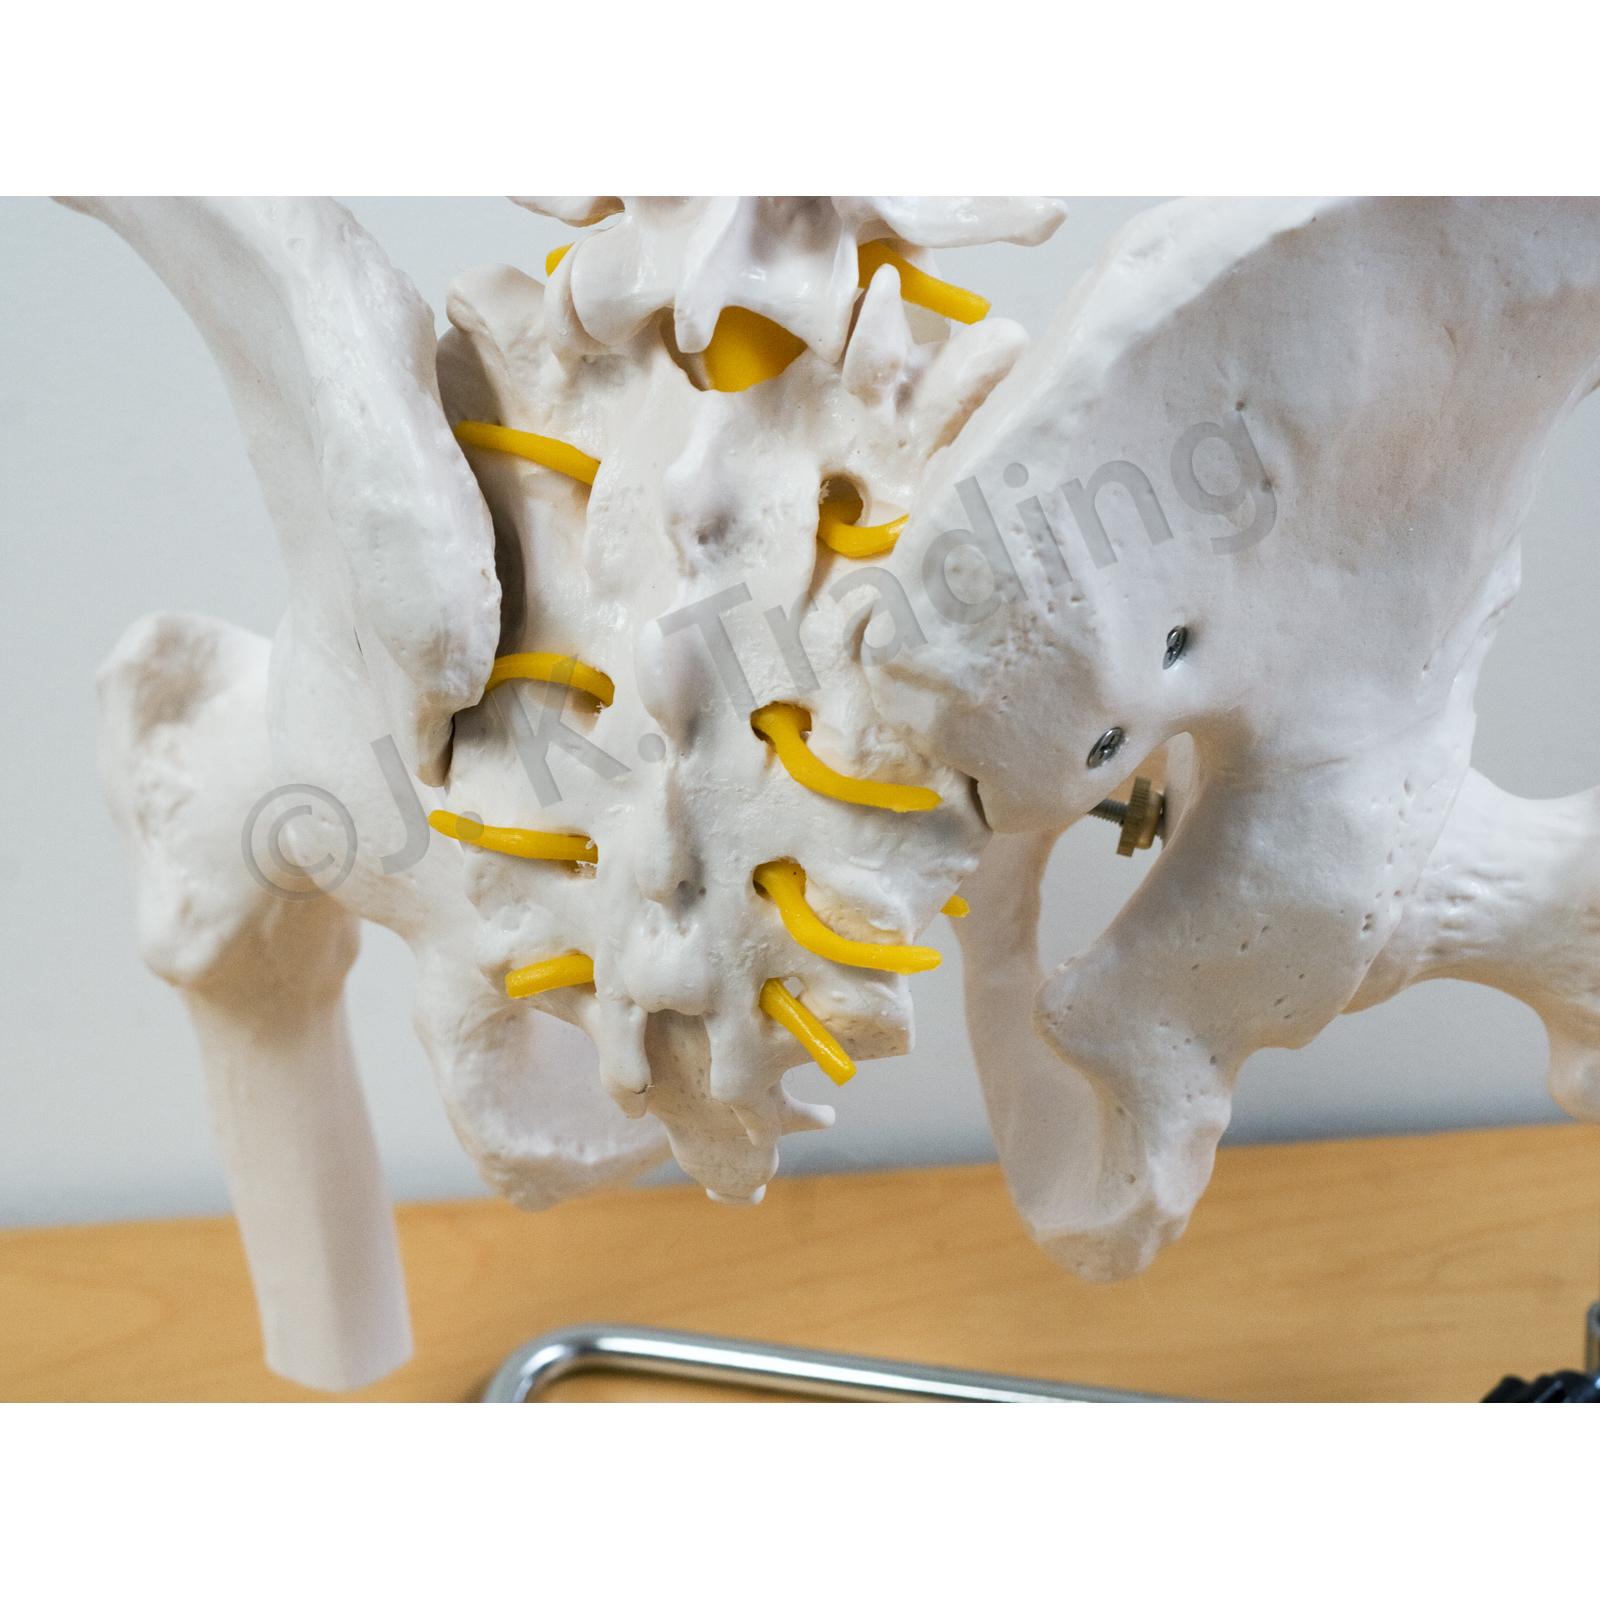 Anatomy Model Spine Model With Pelvis And Femur